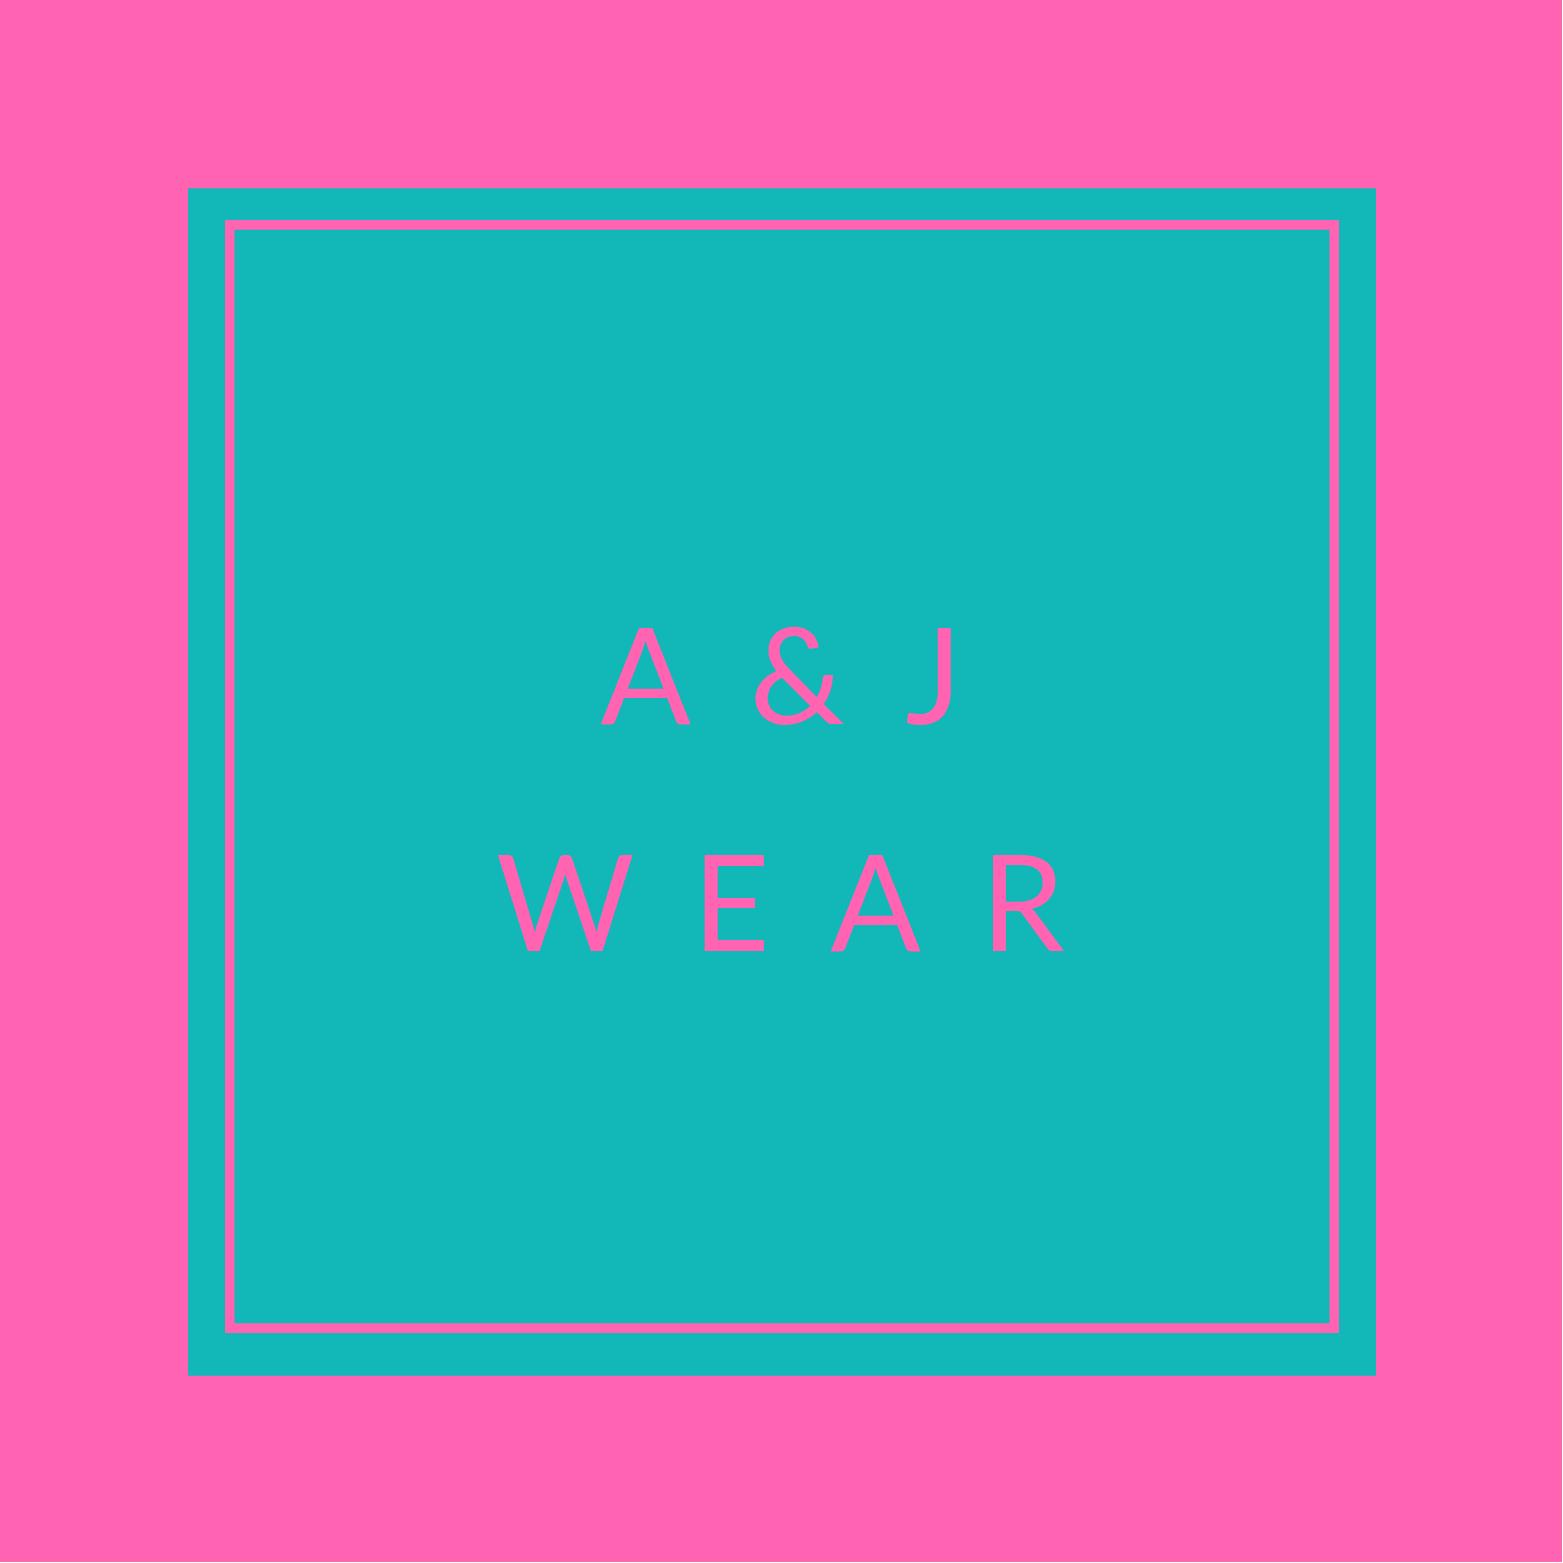 A&J Wear Boutique